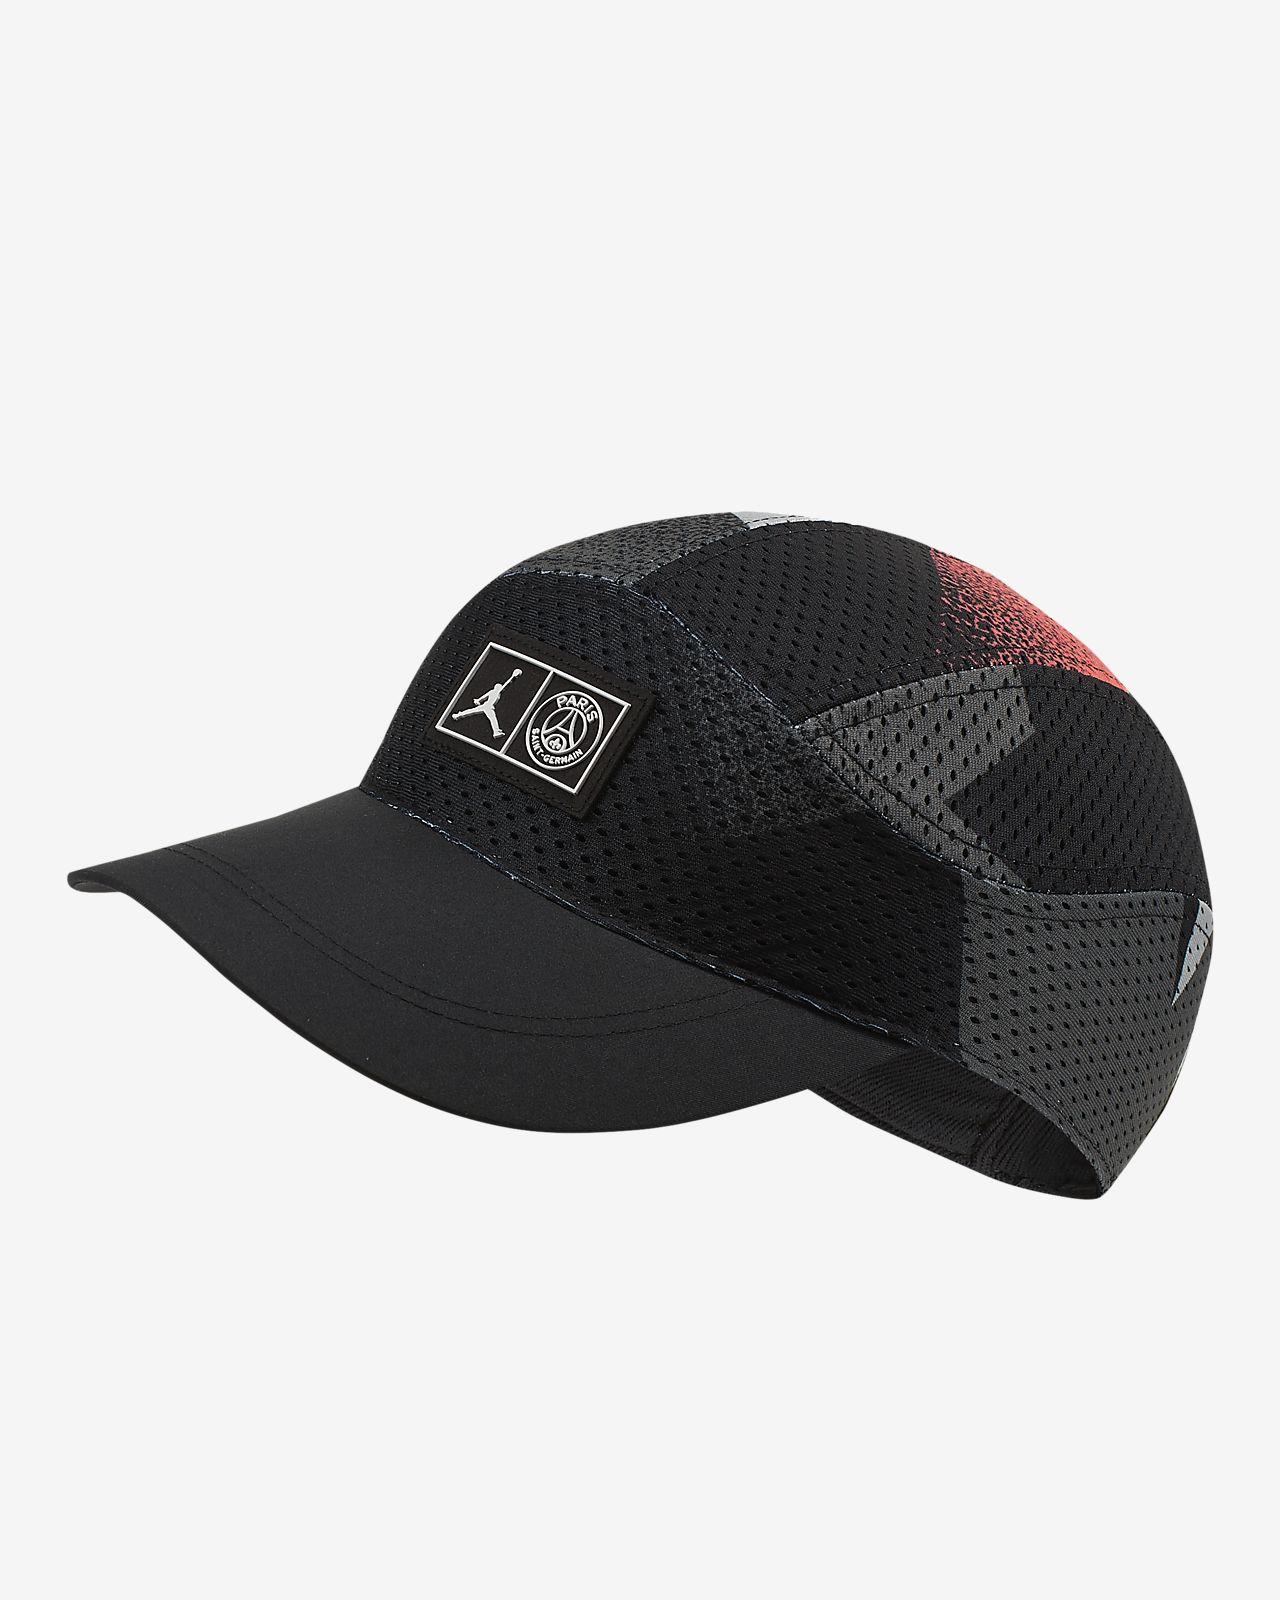 Paris Saint-Germain Tailwind caps